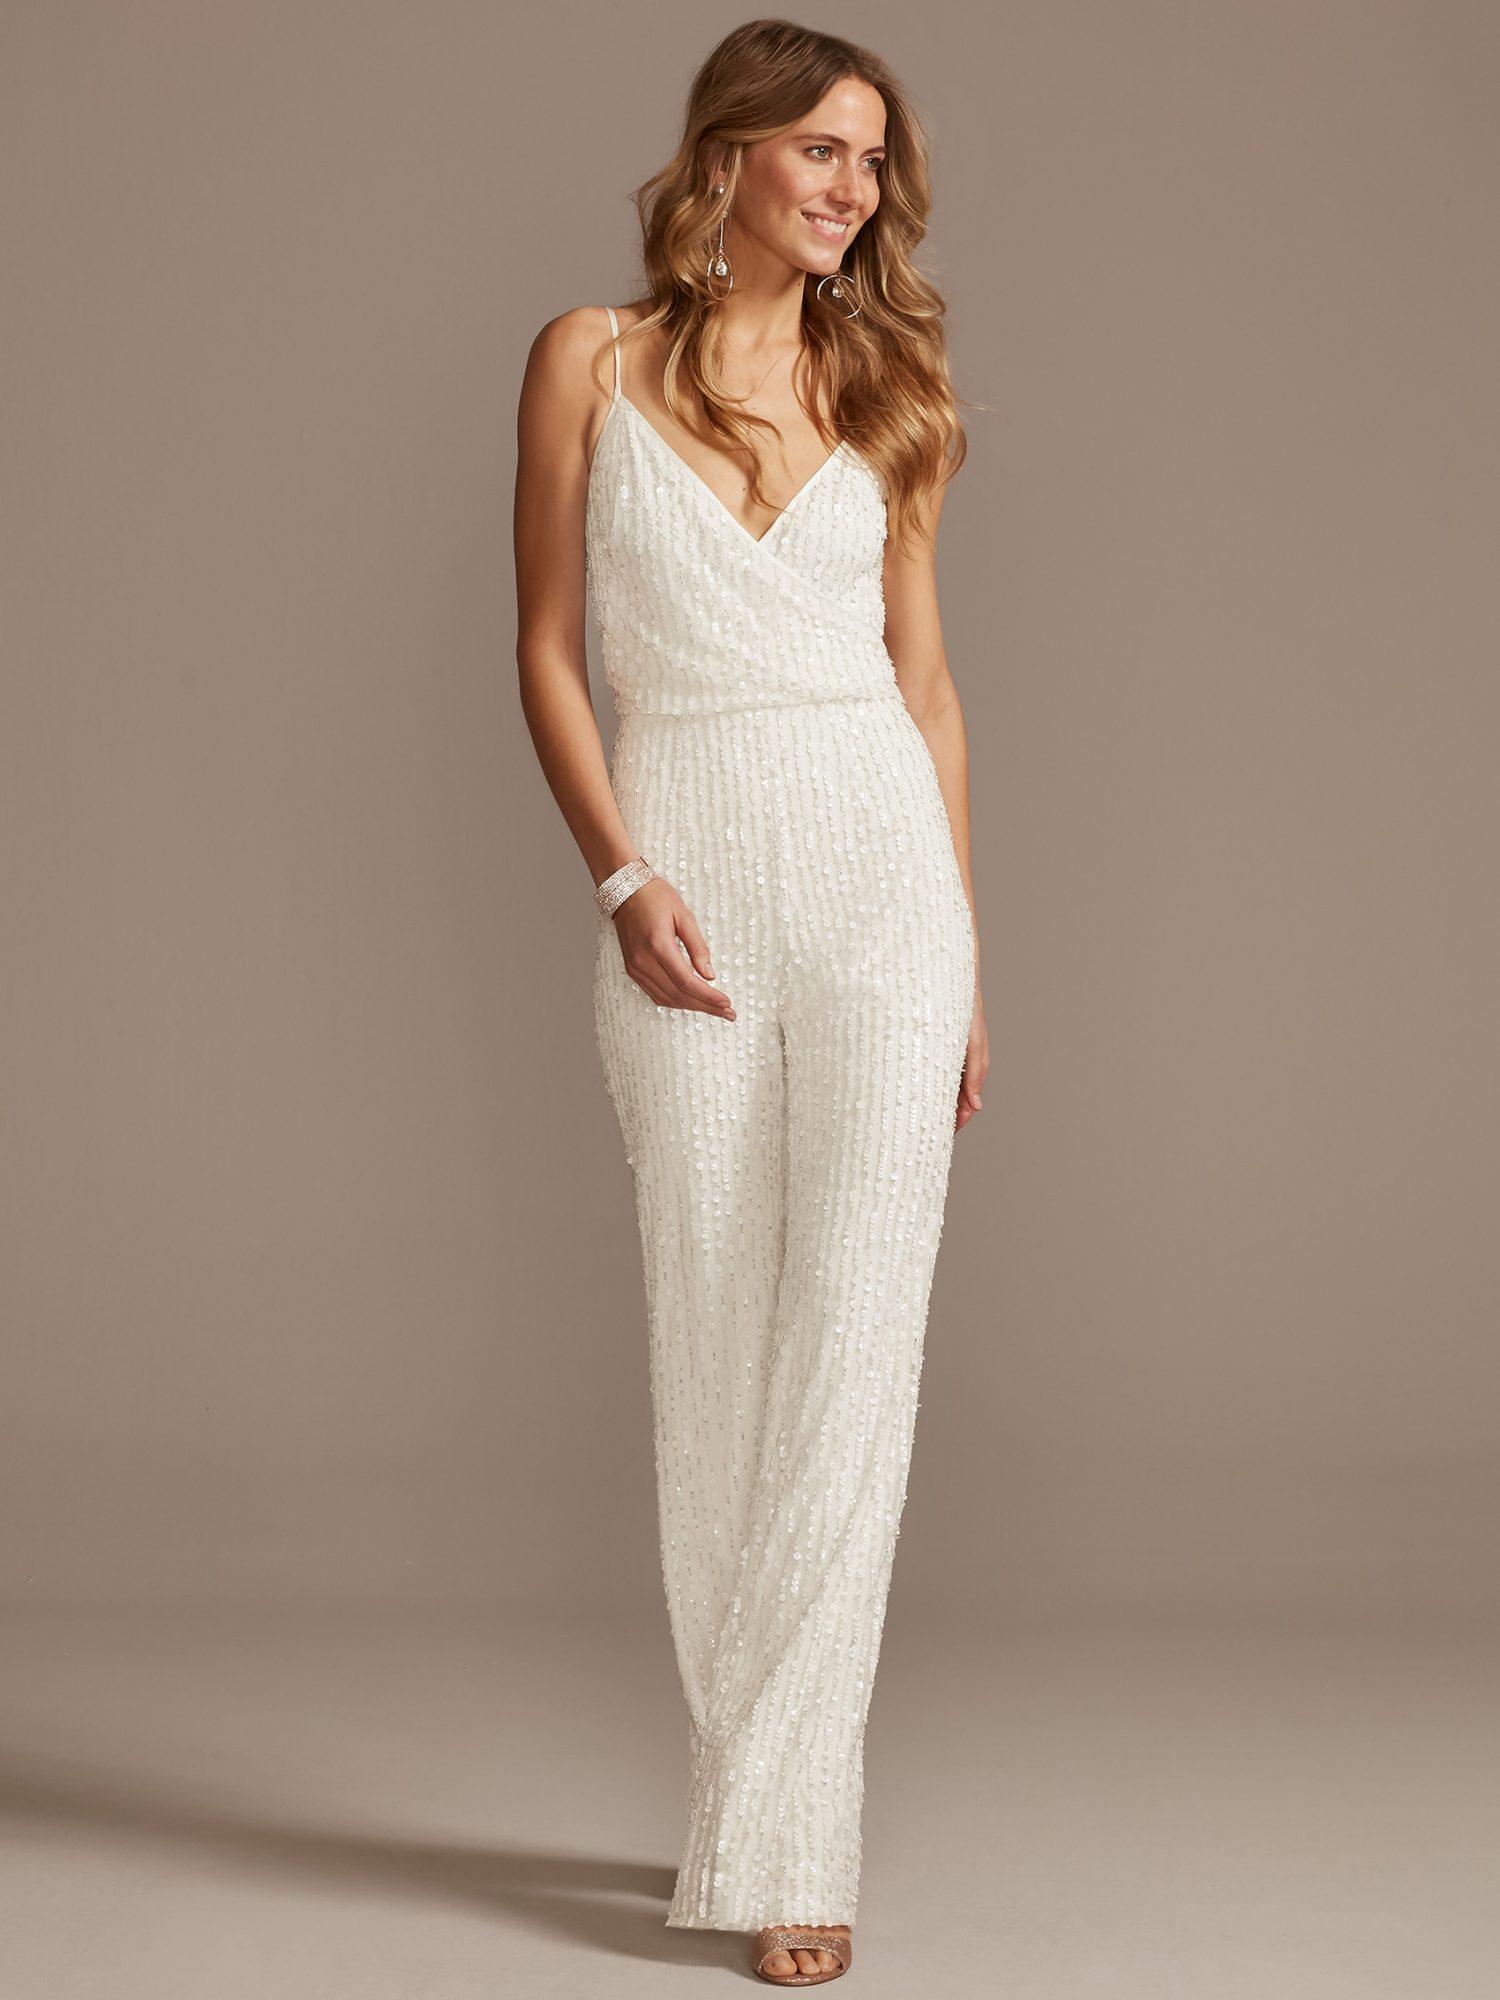 davids bridal beaded jumpsuit wedding dress spring 2021